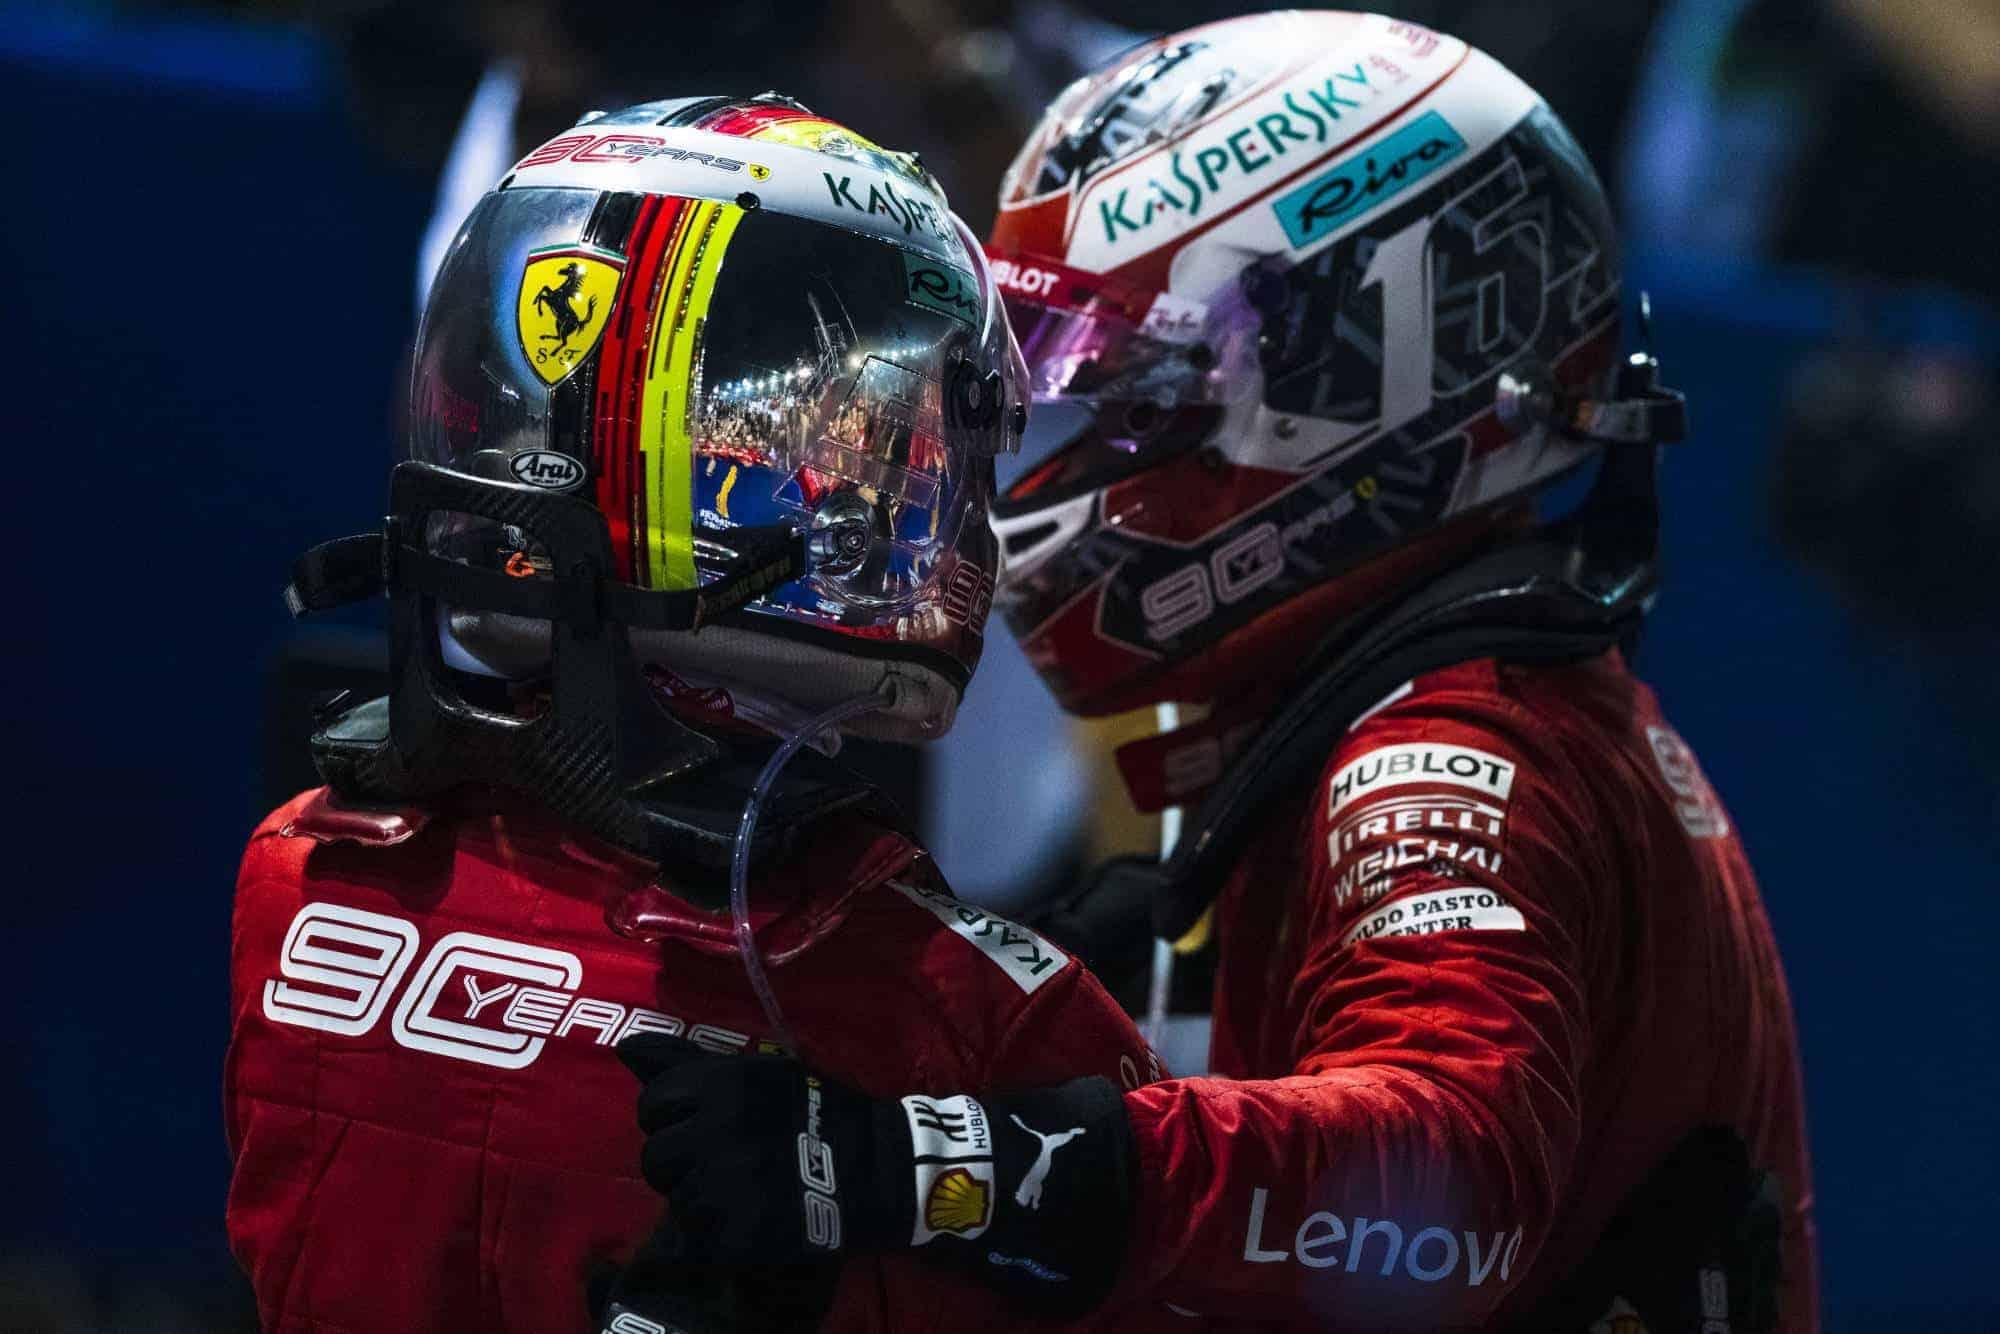 Charles Leclerc and Sebastian Vettel Ferrari SF90 Singapore GP F1 2019 after Race celebrating 1-2 Photo Ferrari